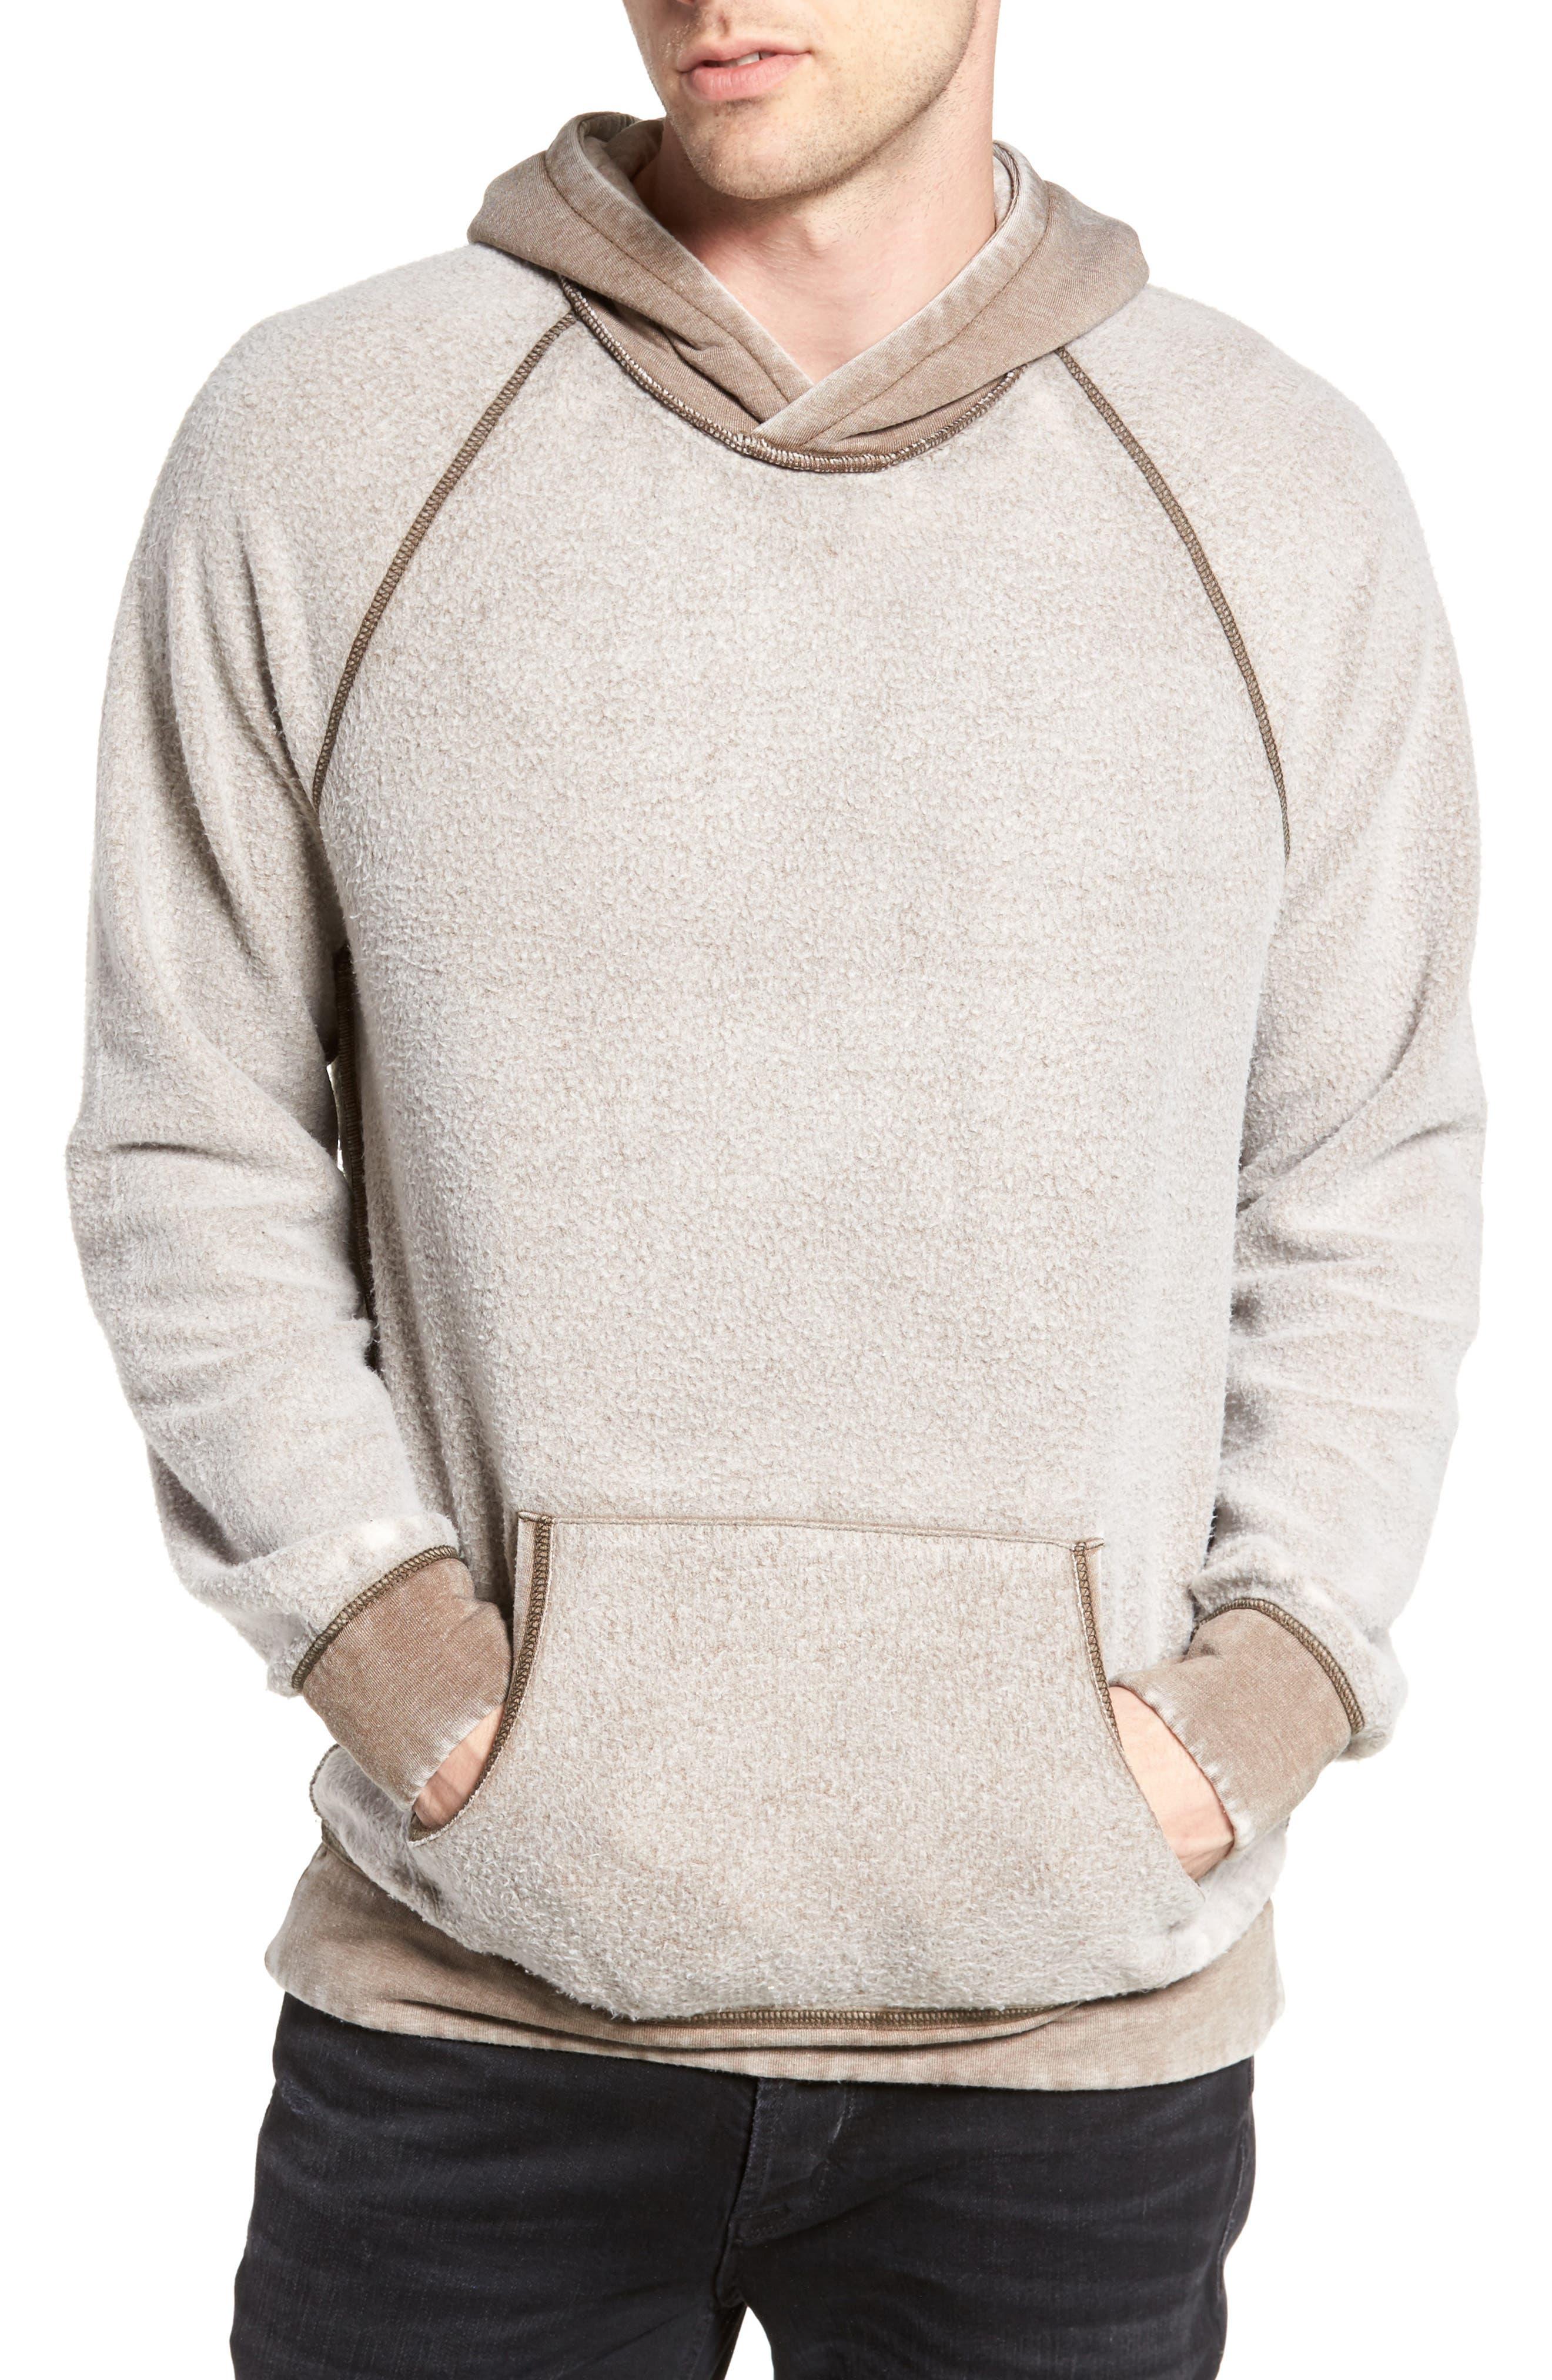 The Rail Reverse Fleece Hoodie